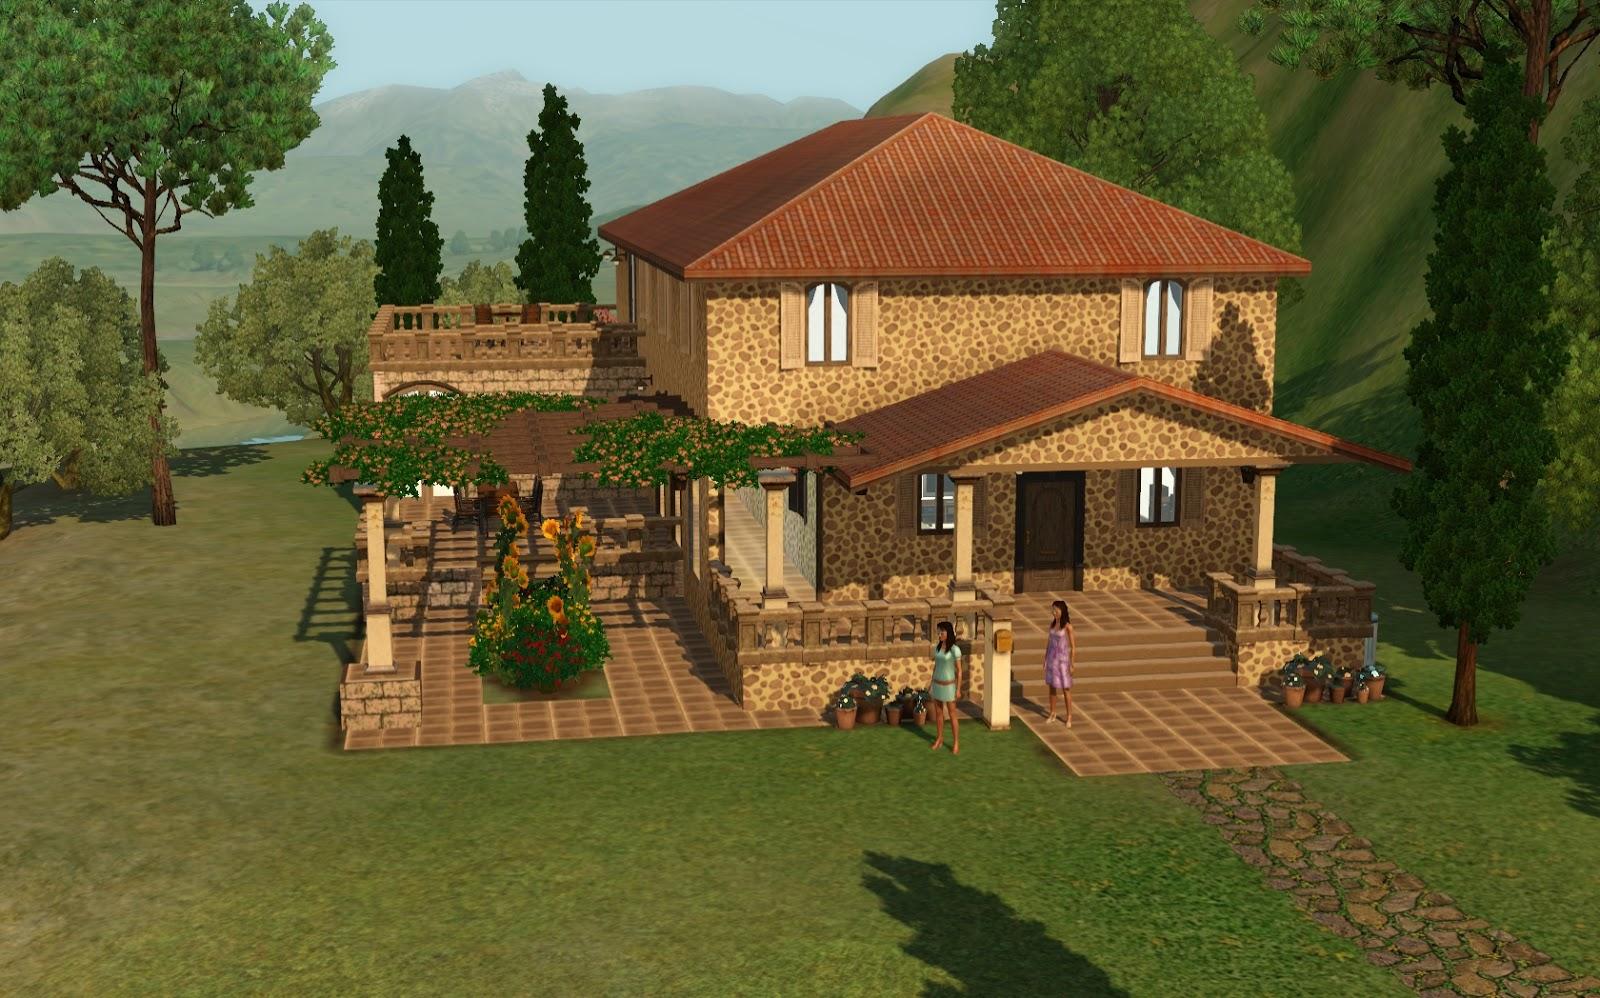 Summer's Little Sims 3 Garden: Monte Vista List of Houses